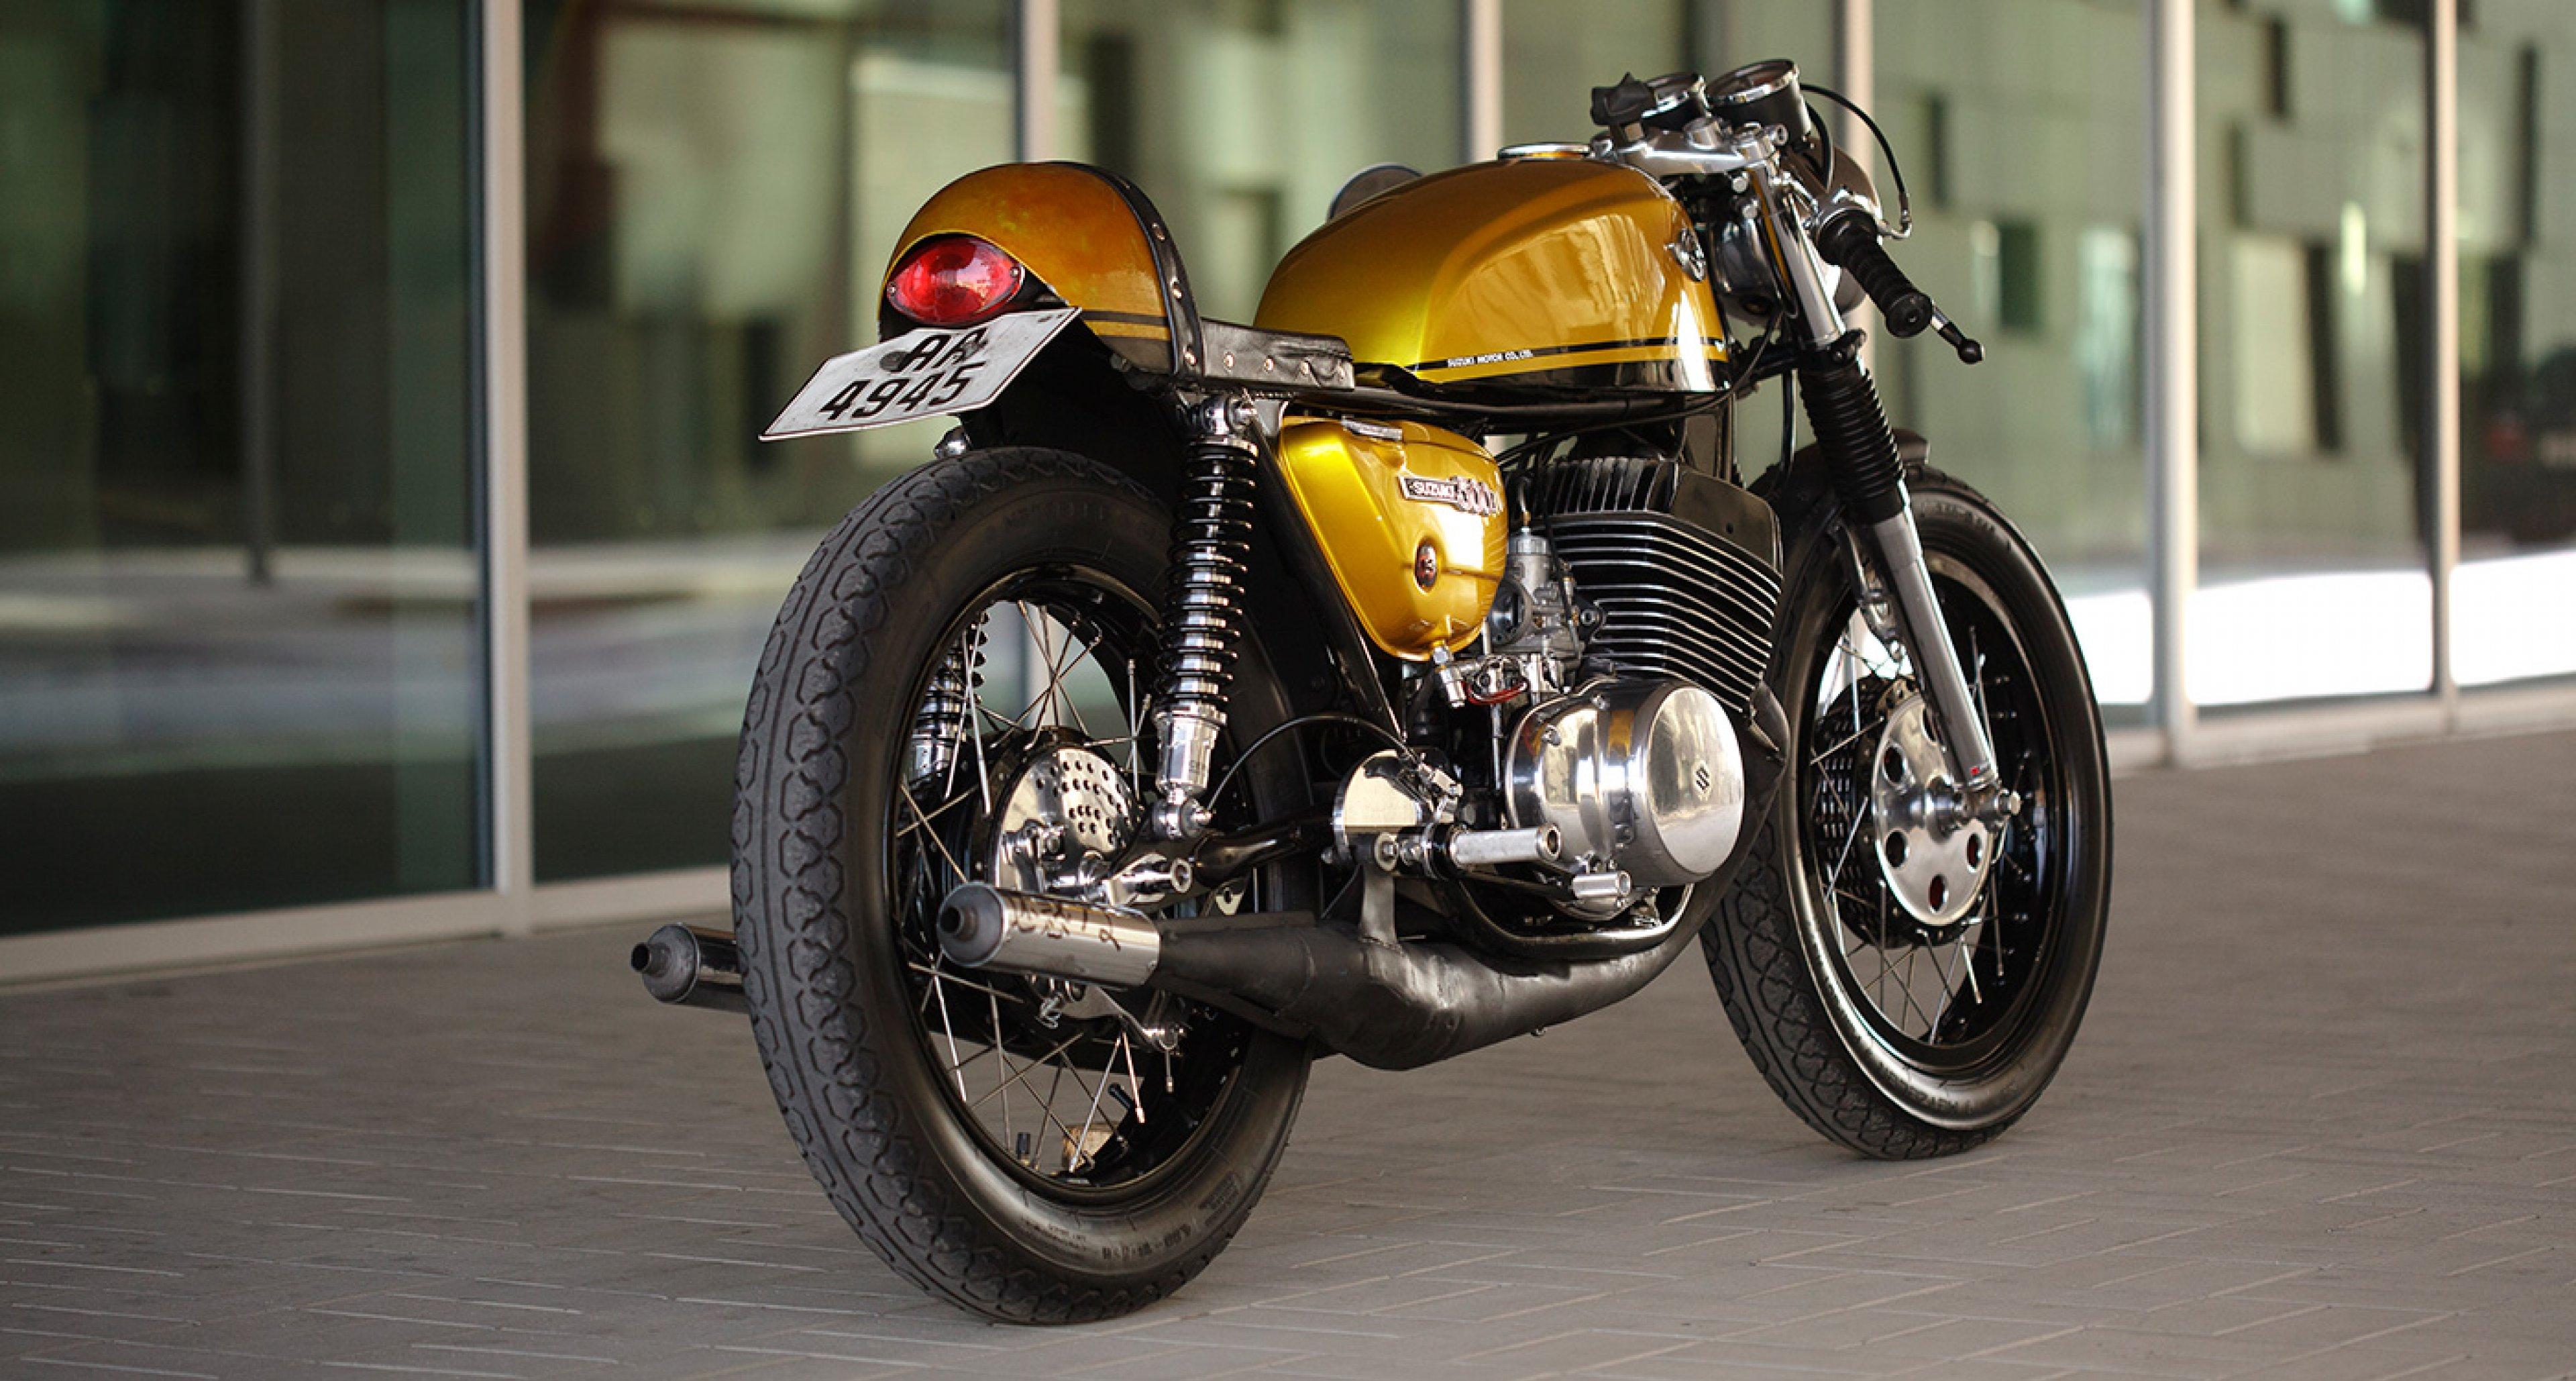 golden goliath: suzuki t500 ii titan café racer | classic driver